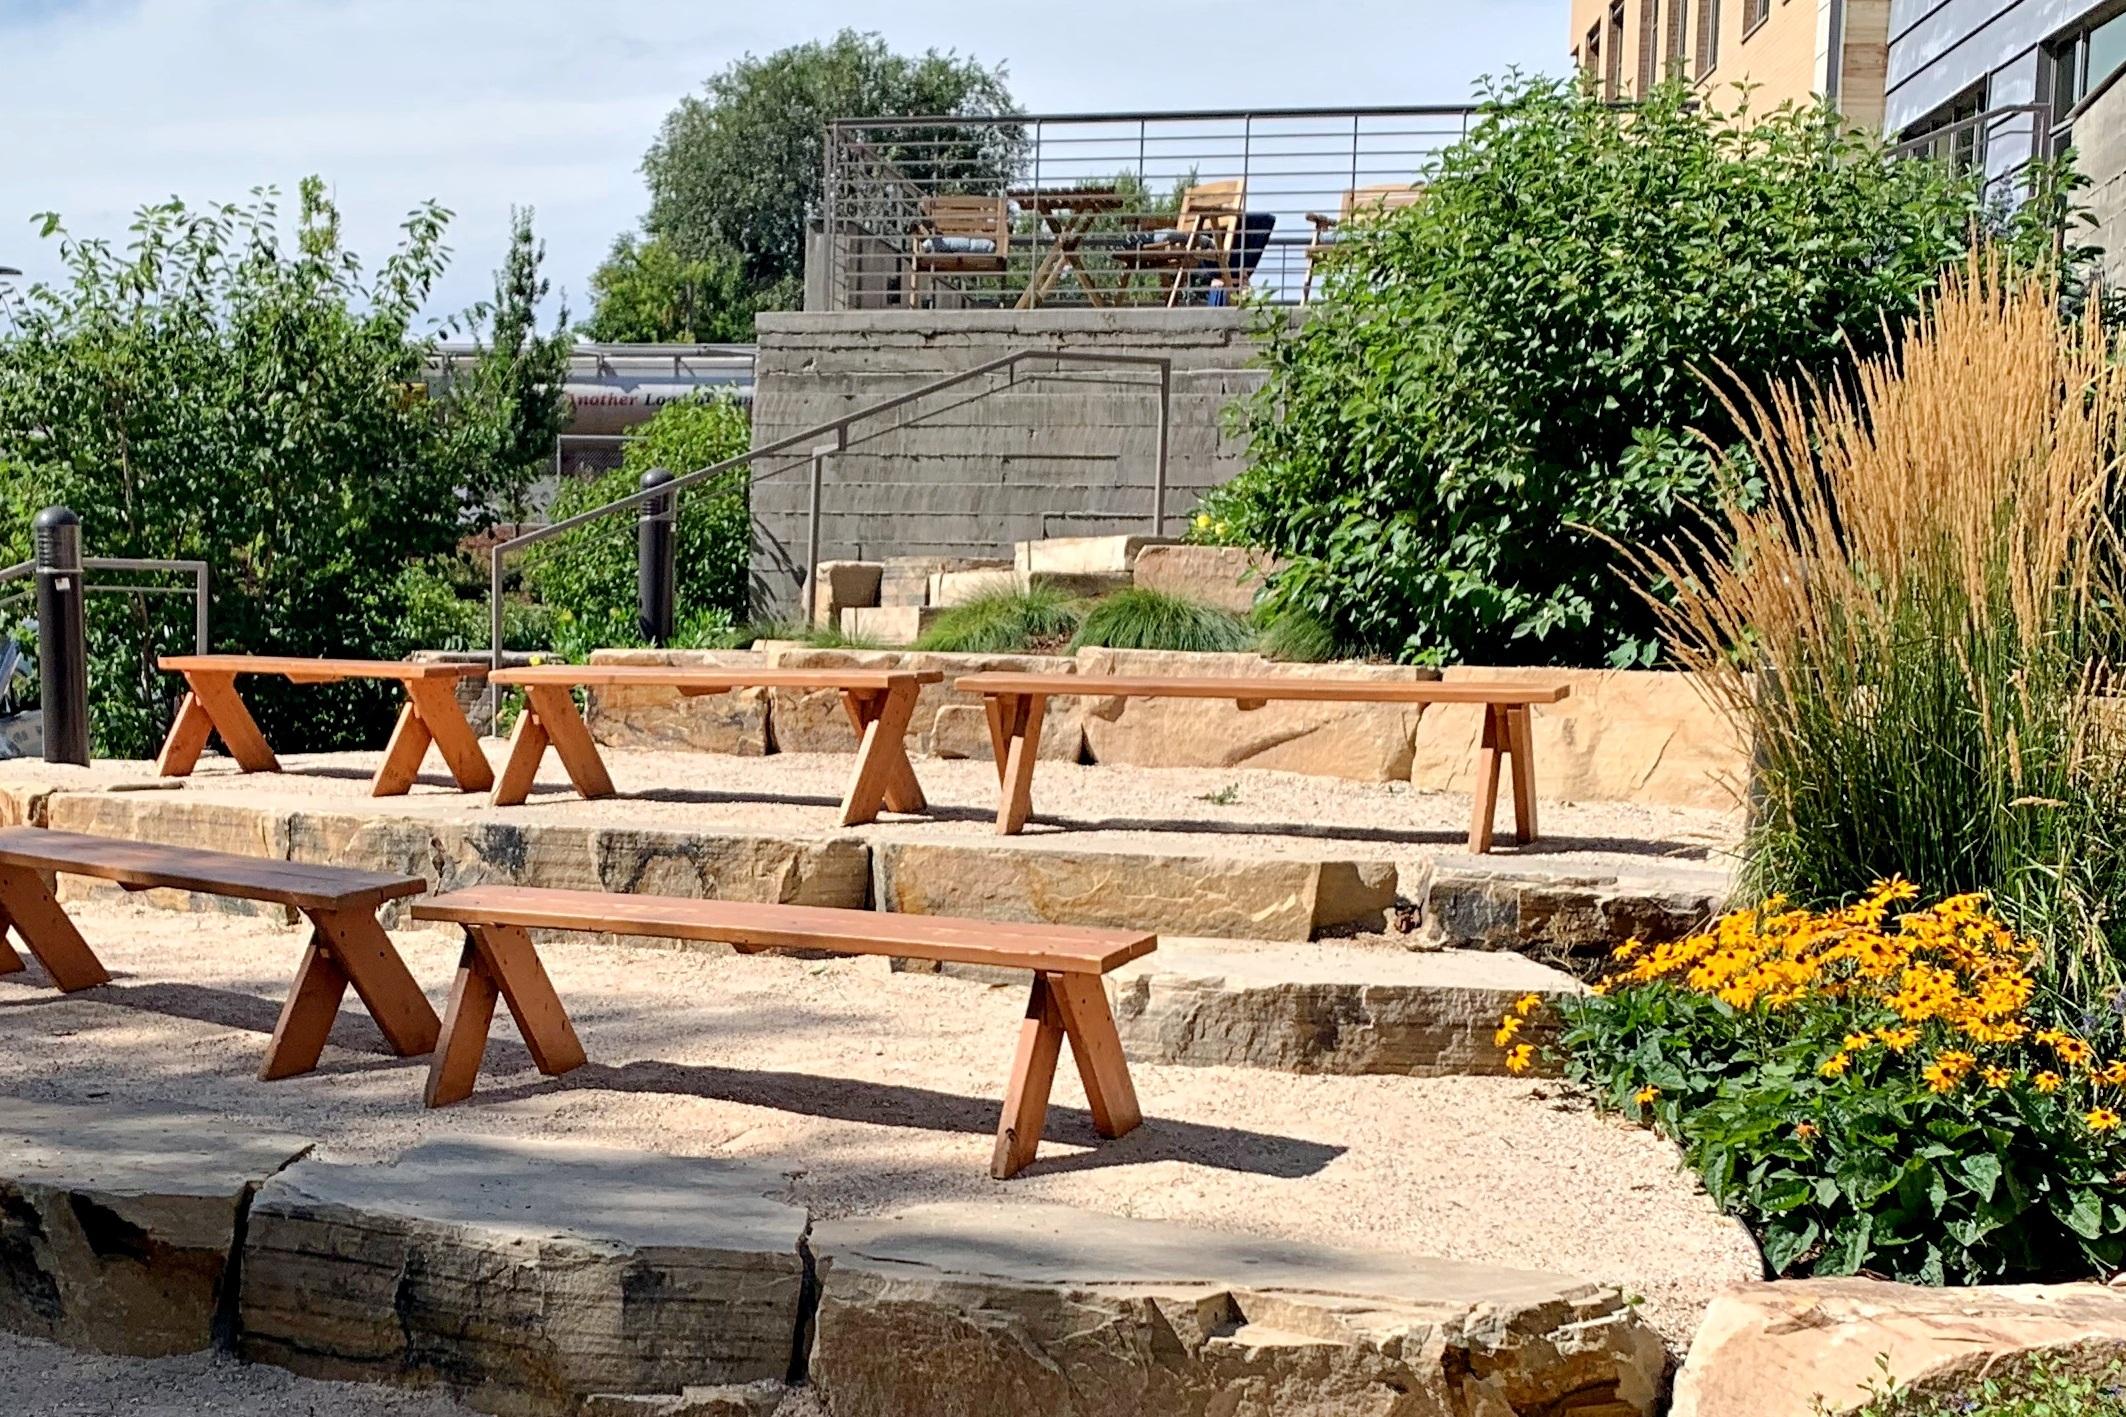 Block_One_Wedding_Benches_River_Terrace_Outdoor.jpg